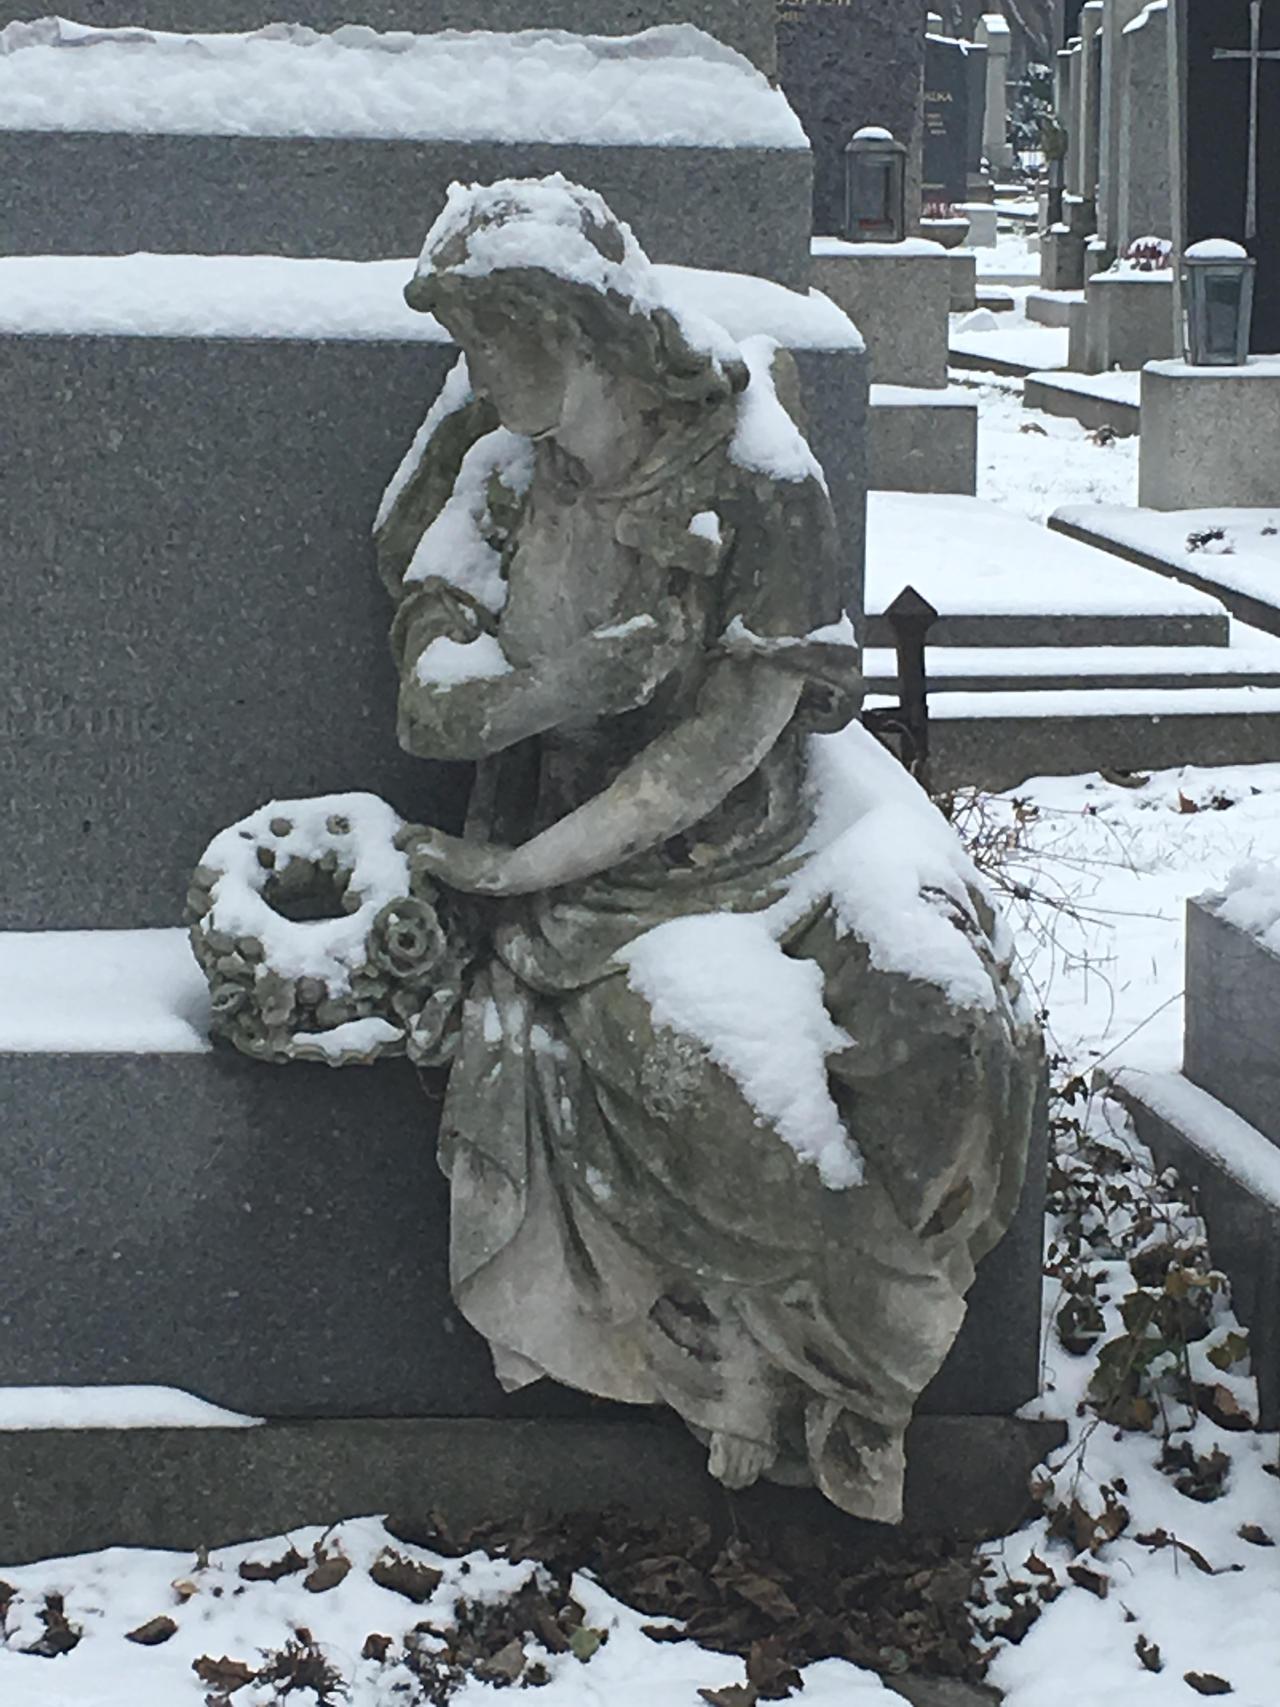 Statue Vienna Zentralfriedhof in snow